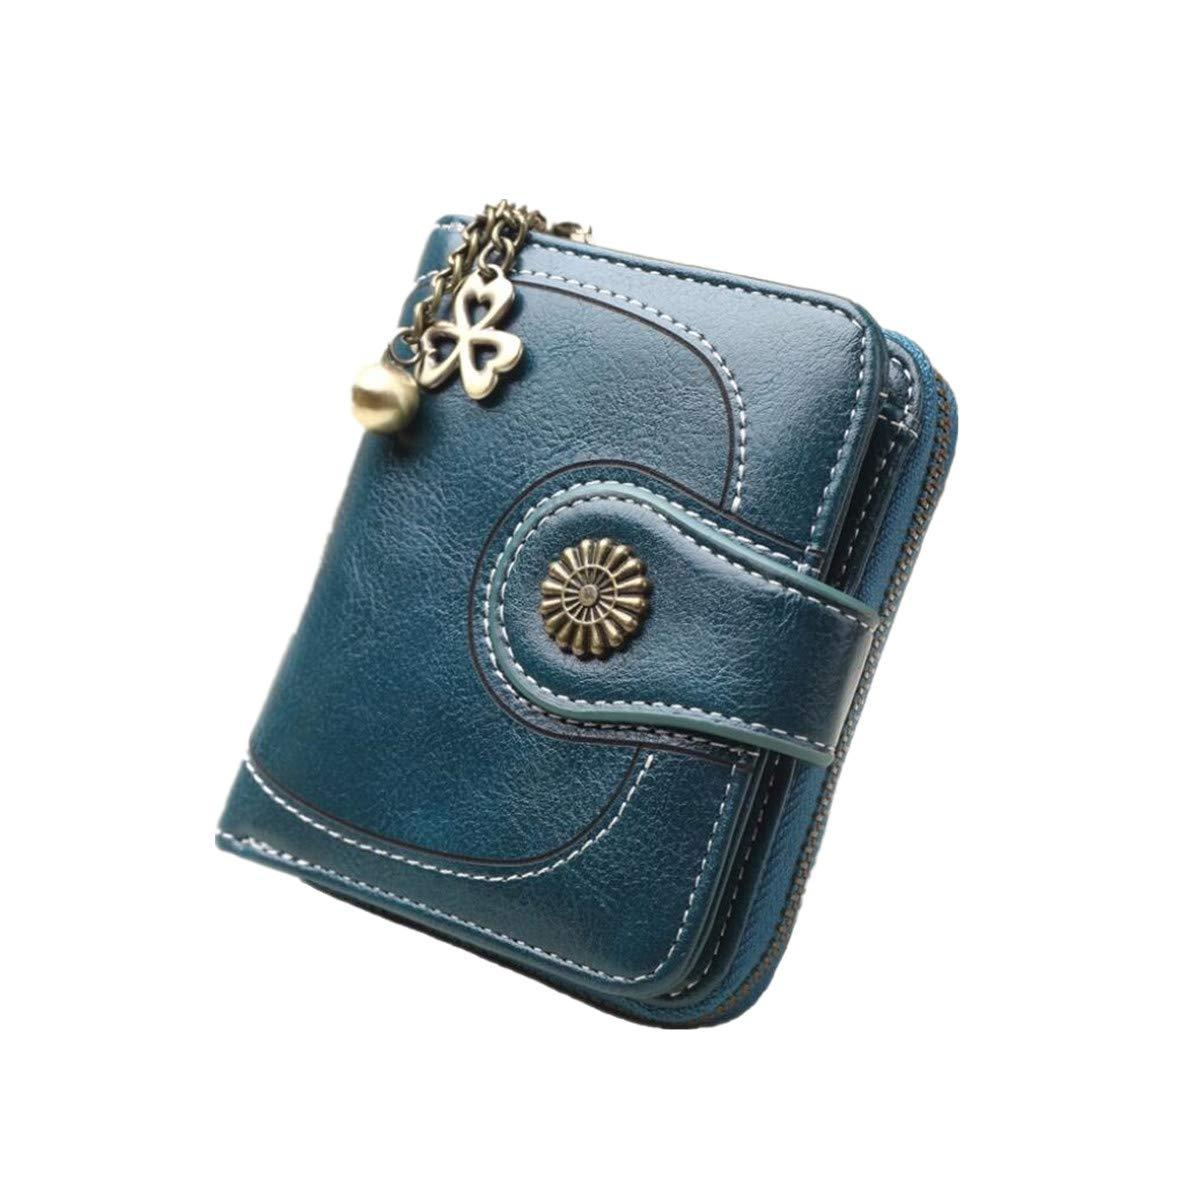 bc54435d0836 LJYH Women's Coin Purse Wristlet Handbag Vintage Clutch Bag Oil Wax ...